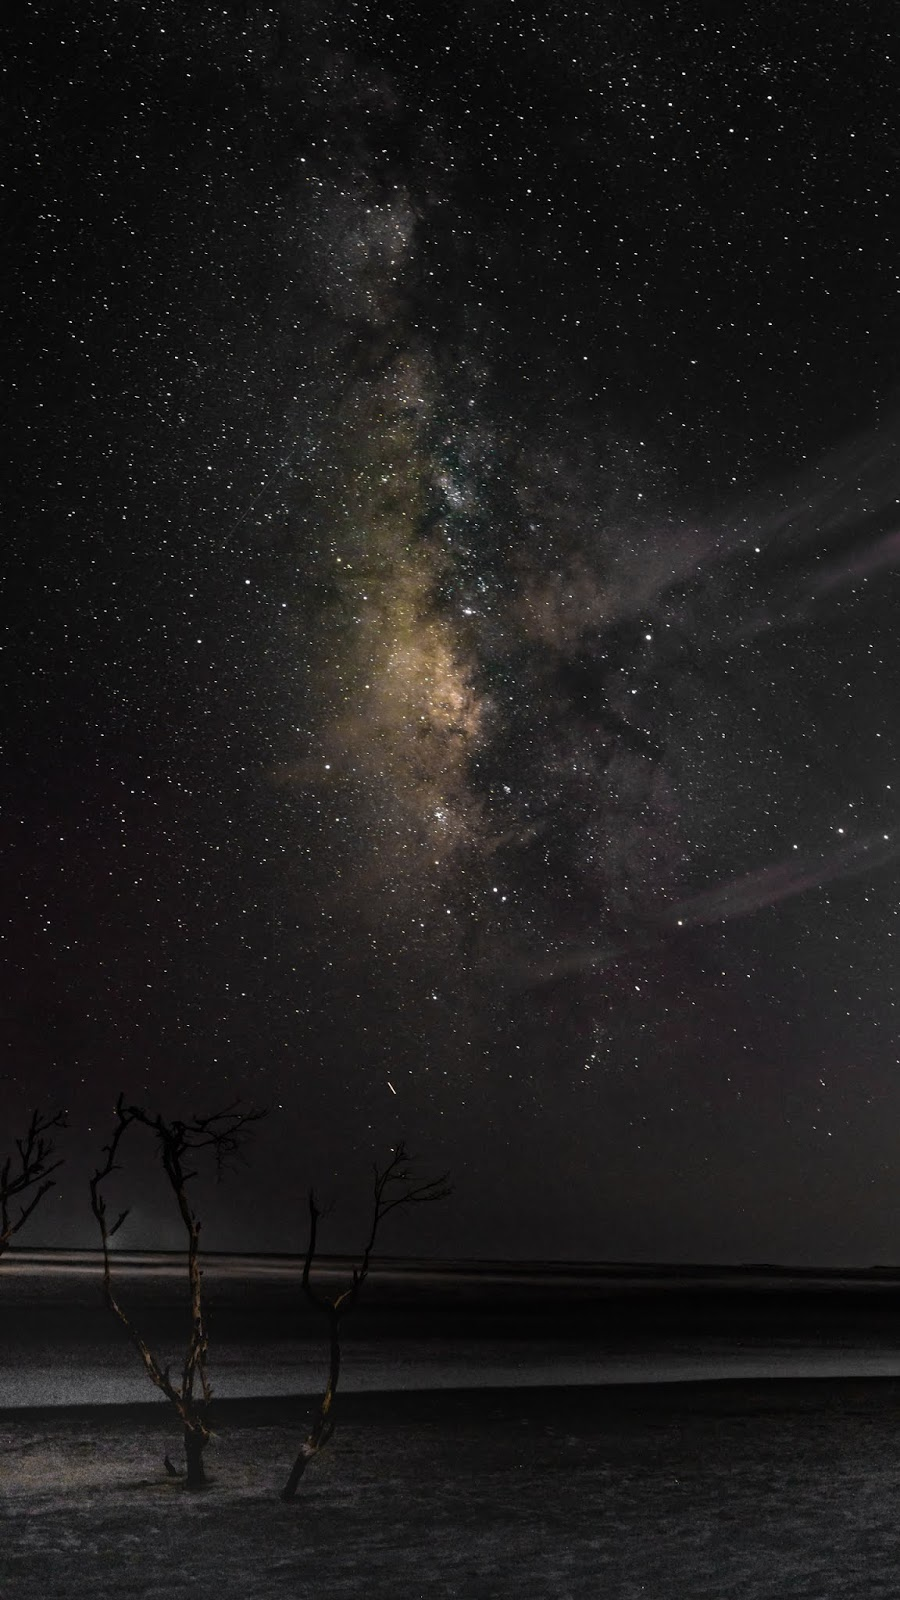 Beach in the starry night